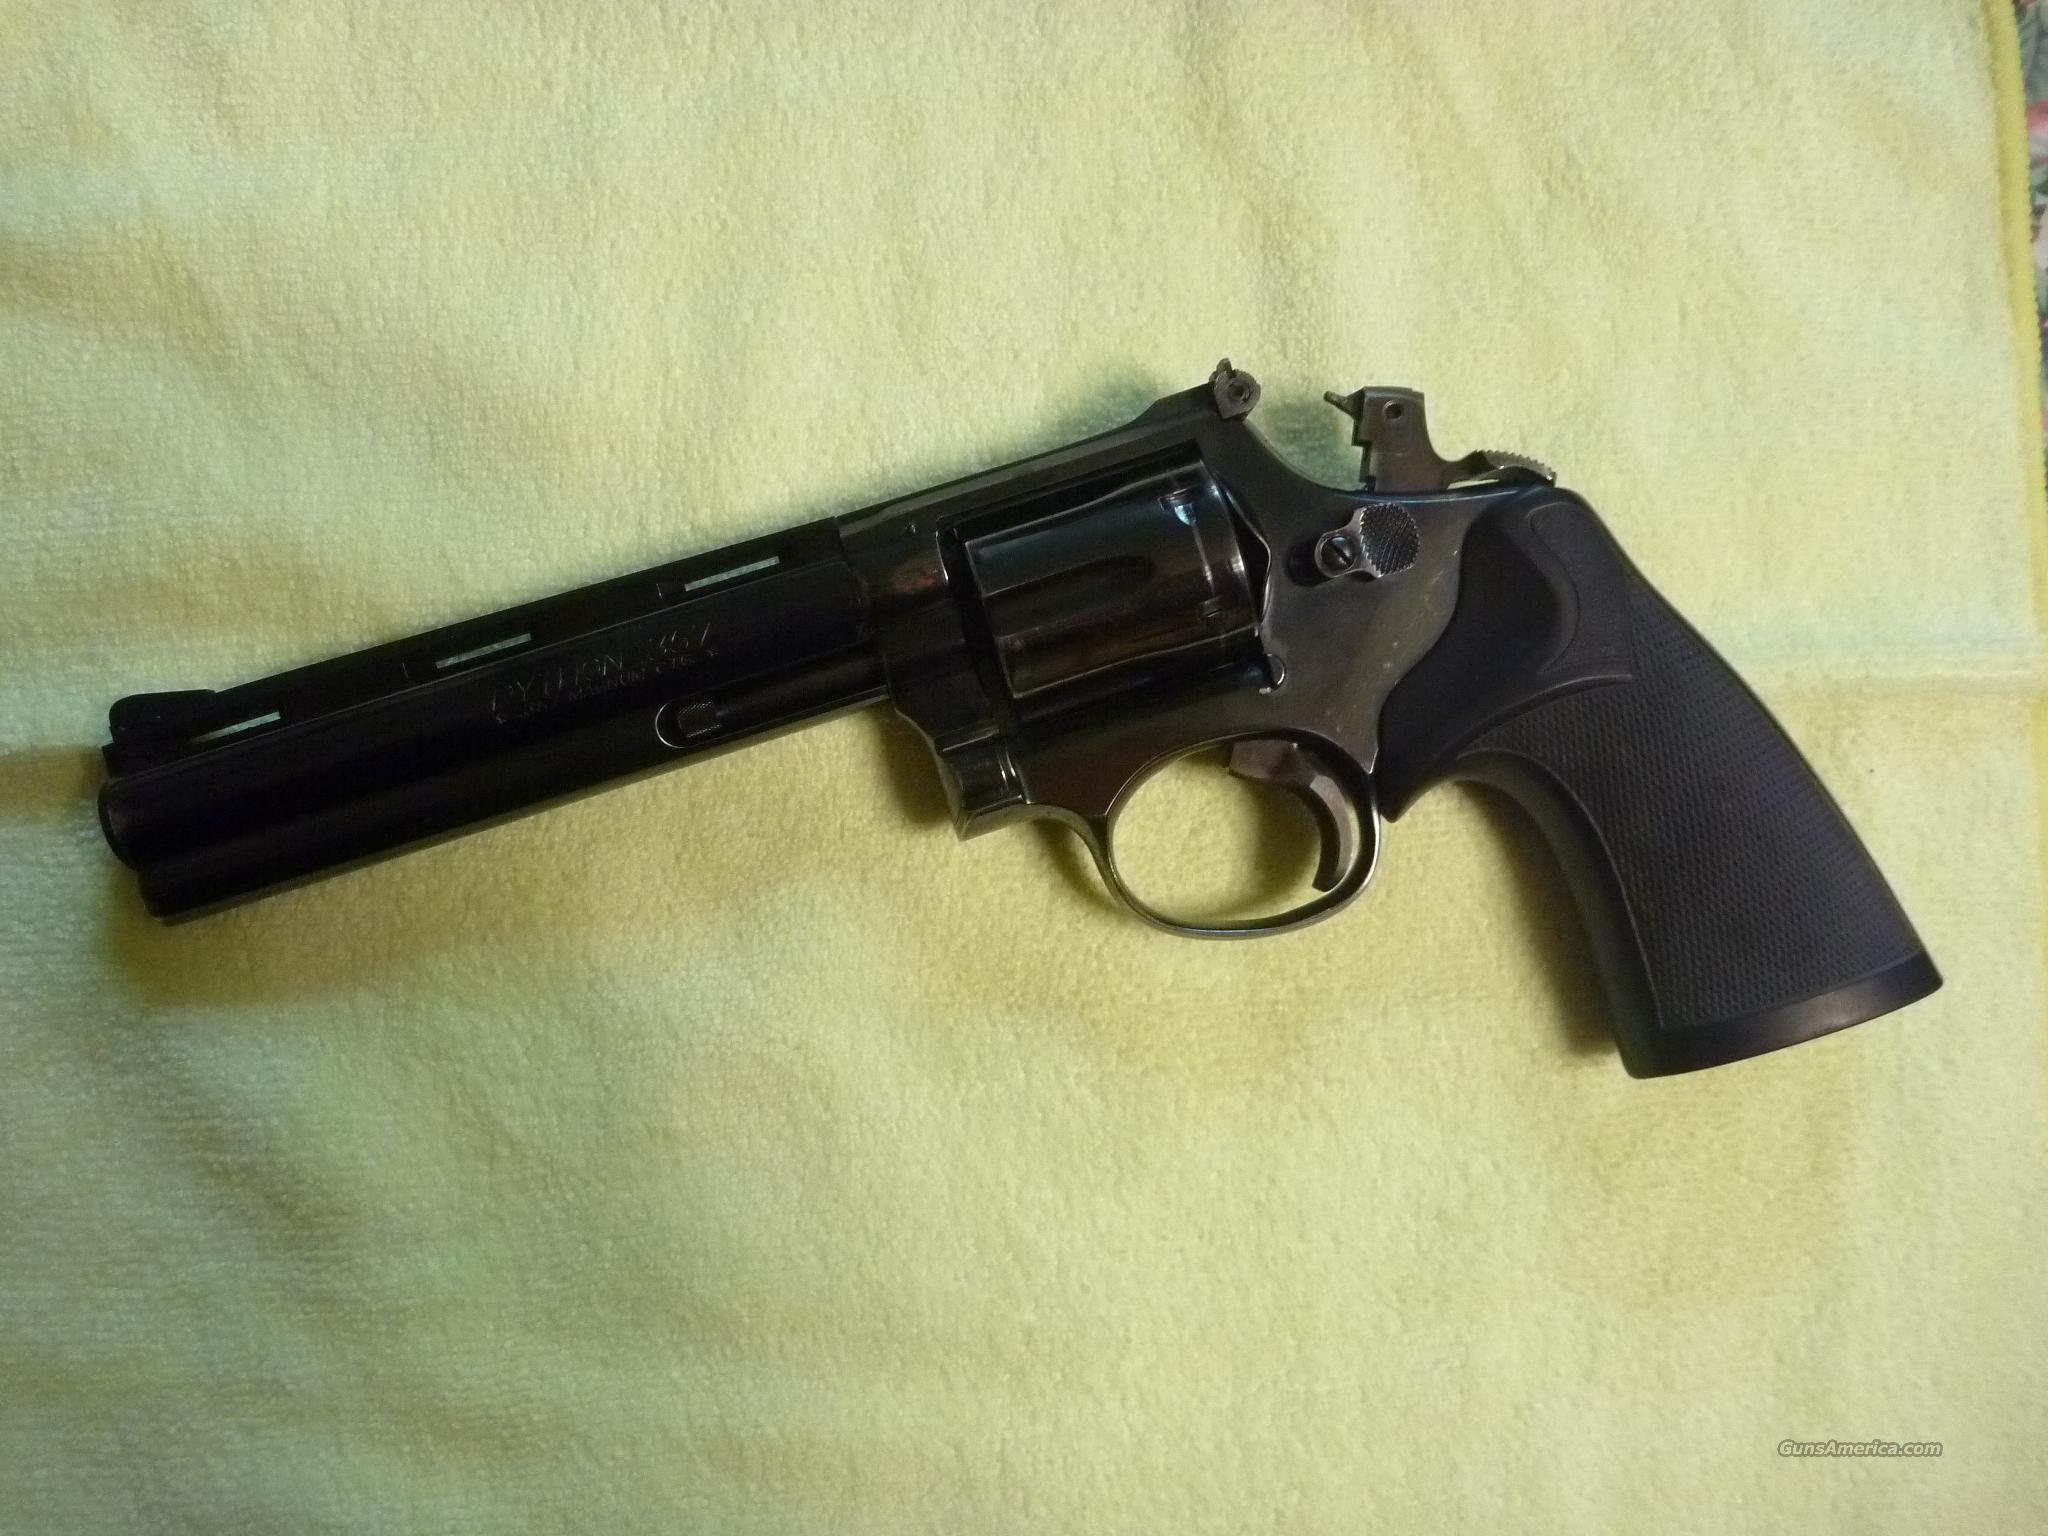 Model 19 with Colt Python Barrel  Guns > Pistols > Smith & Wesson Revolvers > Full Frame Revolver